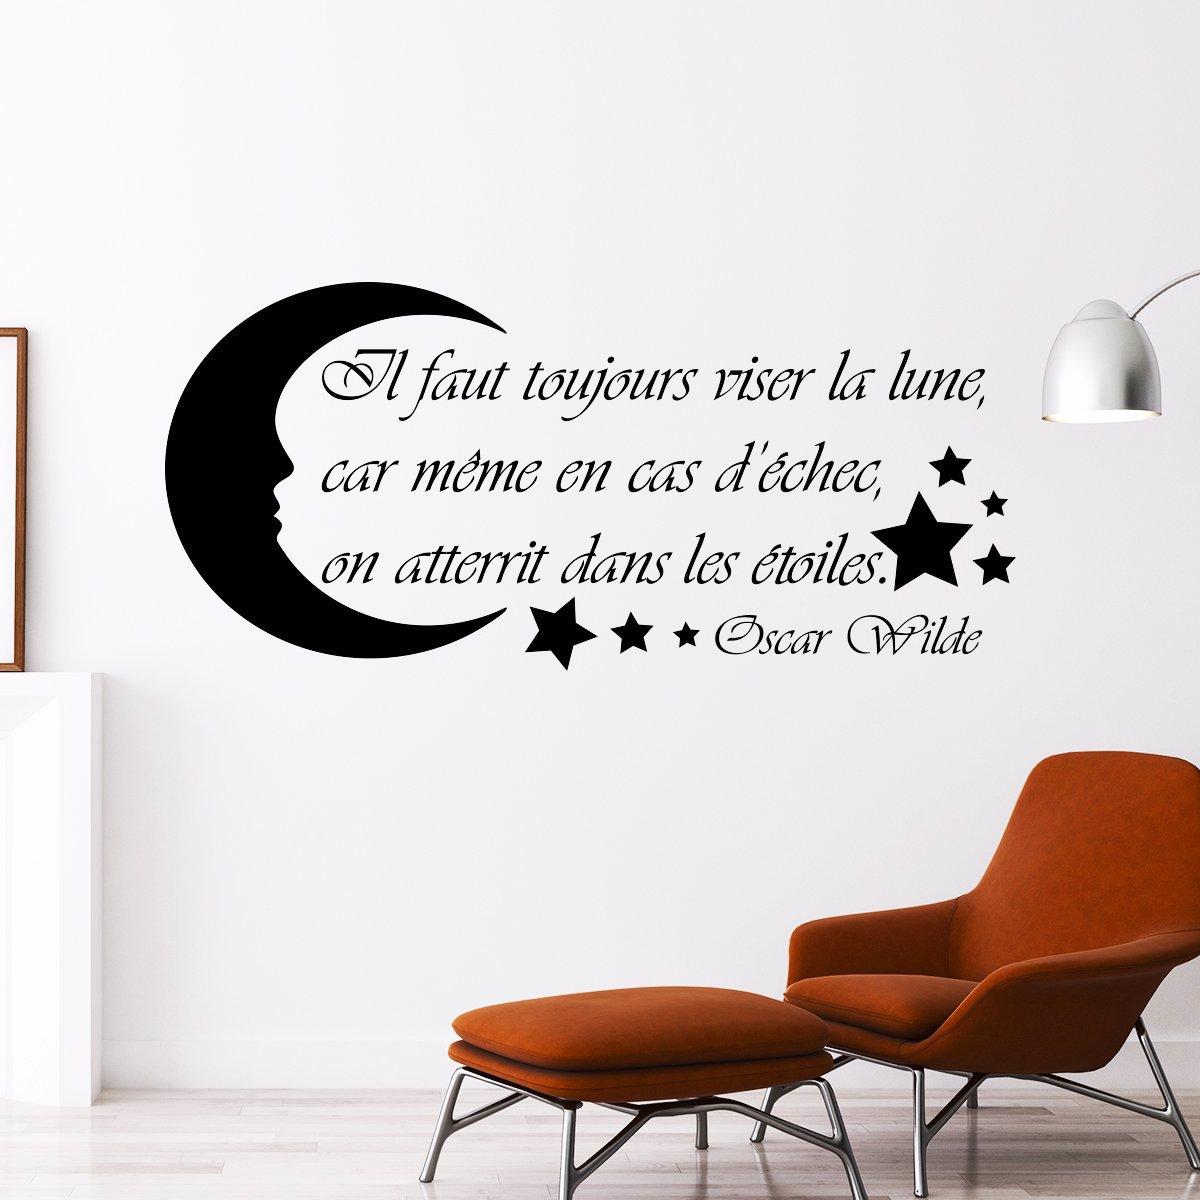 Wall Decal French Quote Oscar Wilde Il Faut Toujours Viser La Lune H55 X L120cm